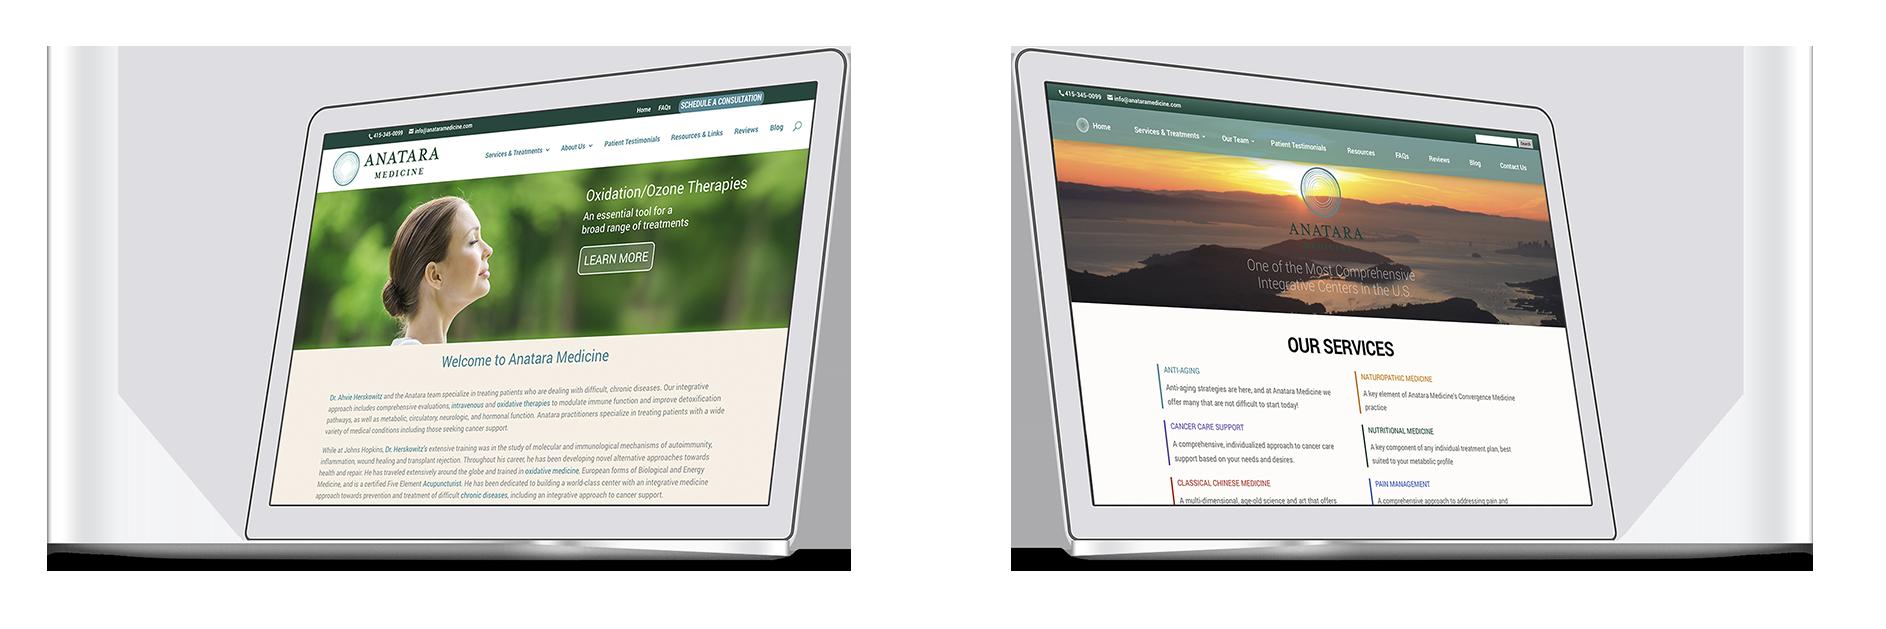 Anatara Medicine Refreshed Design 2016